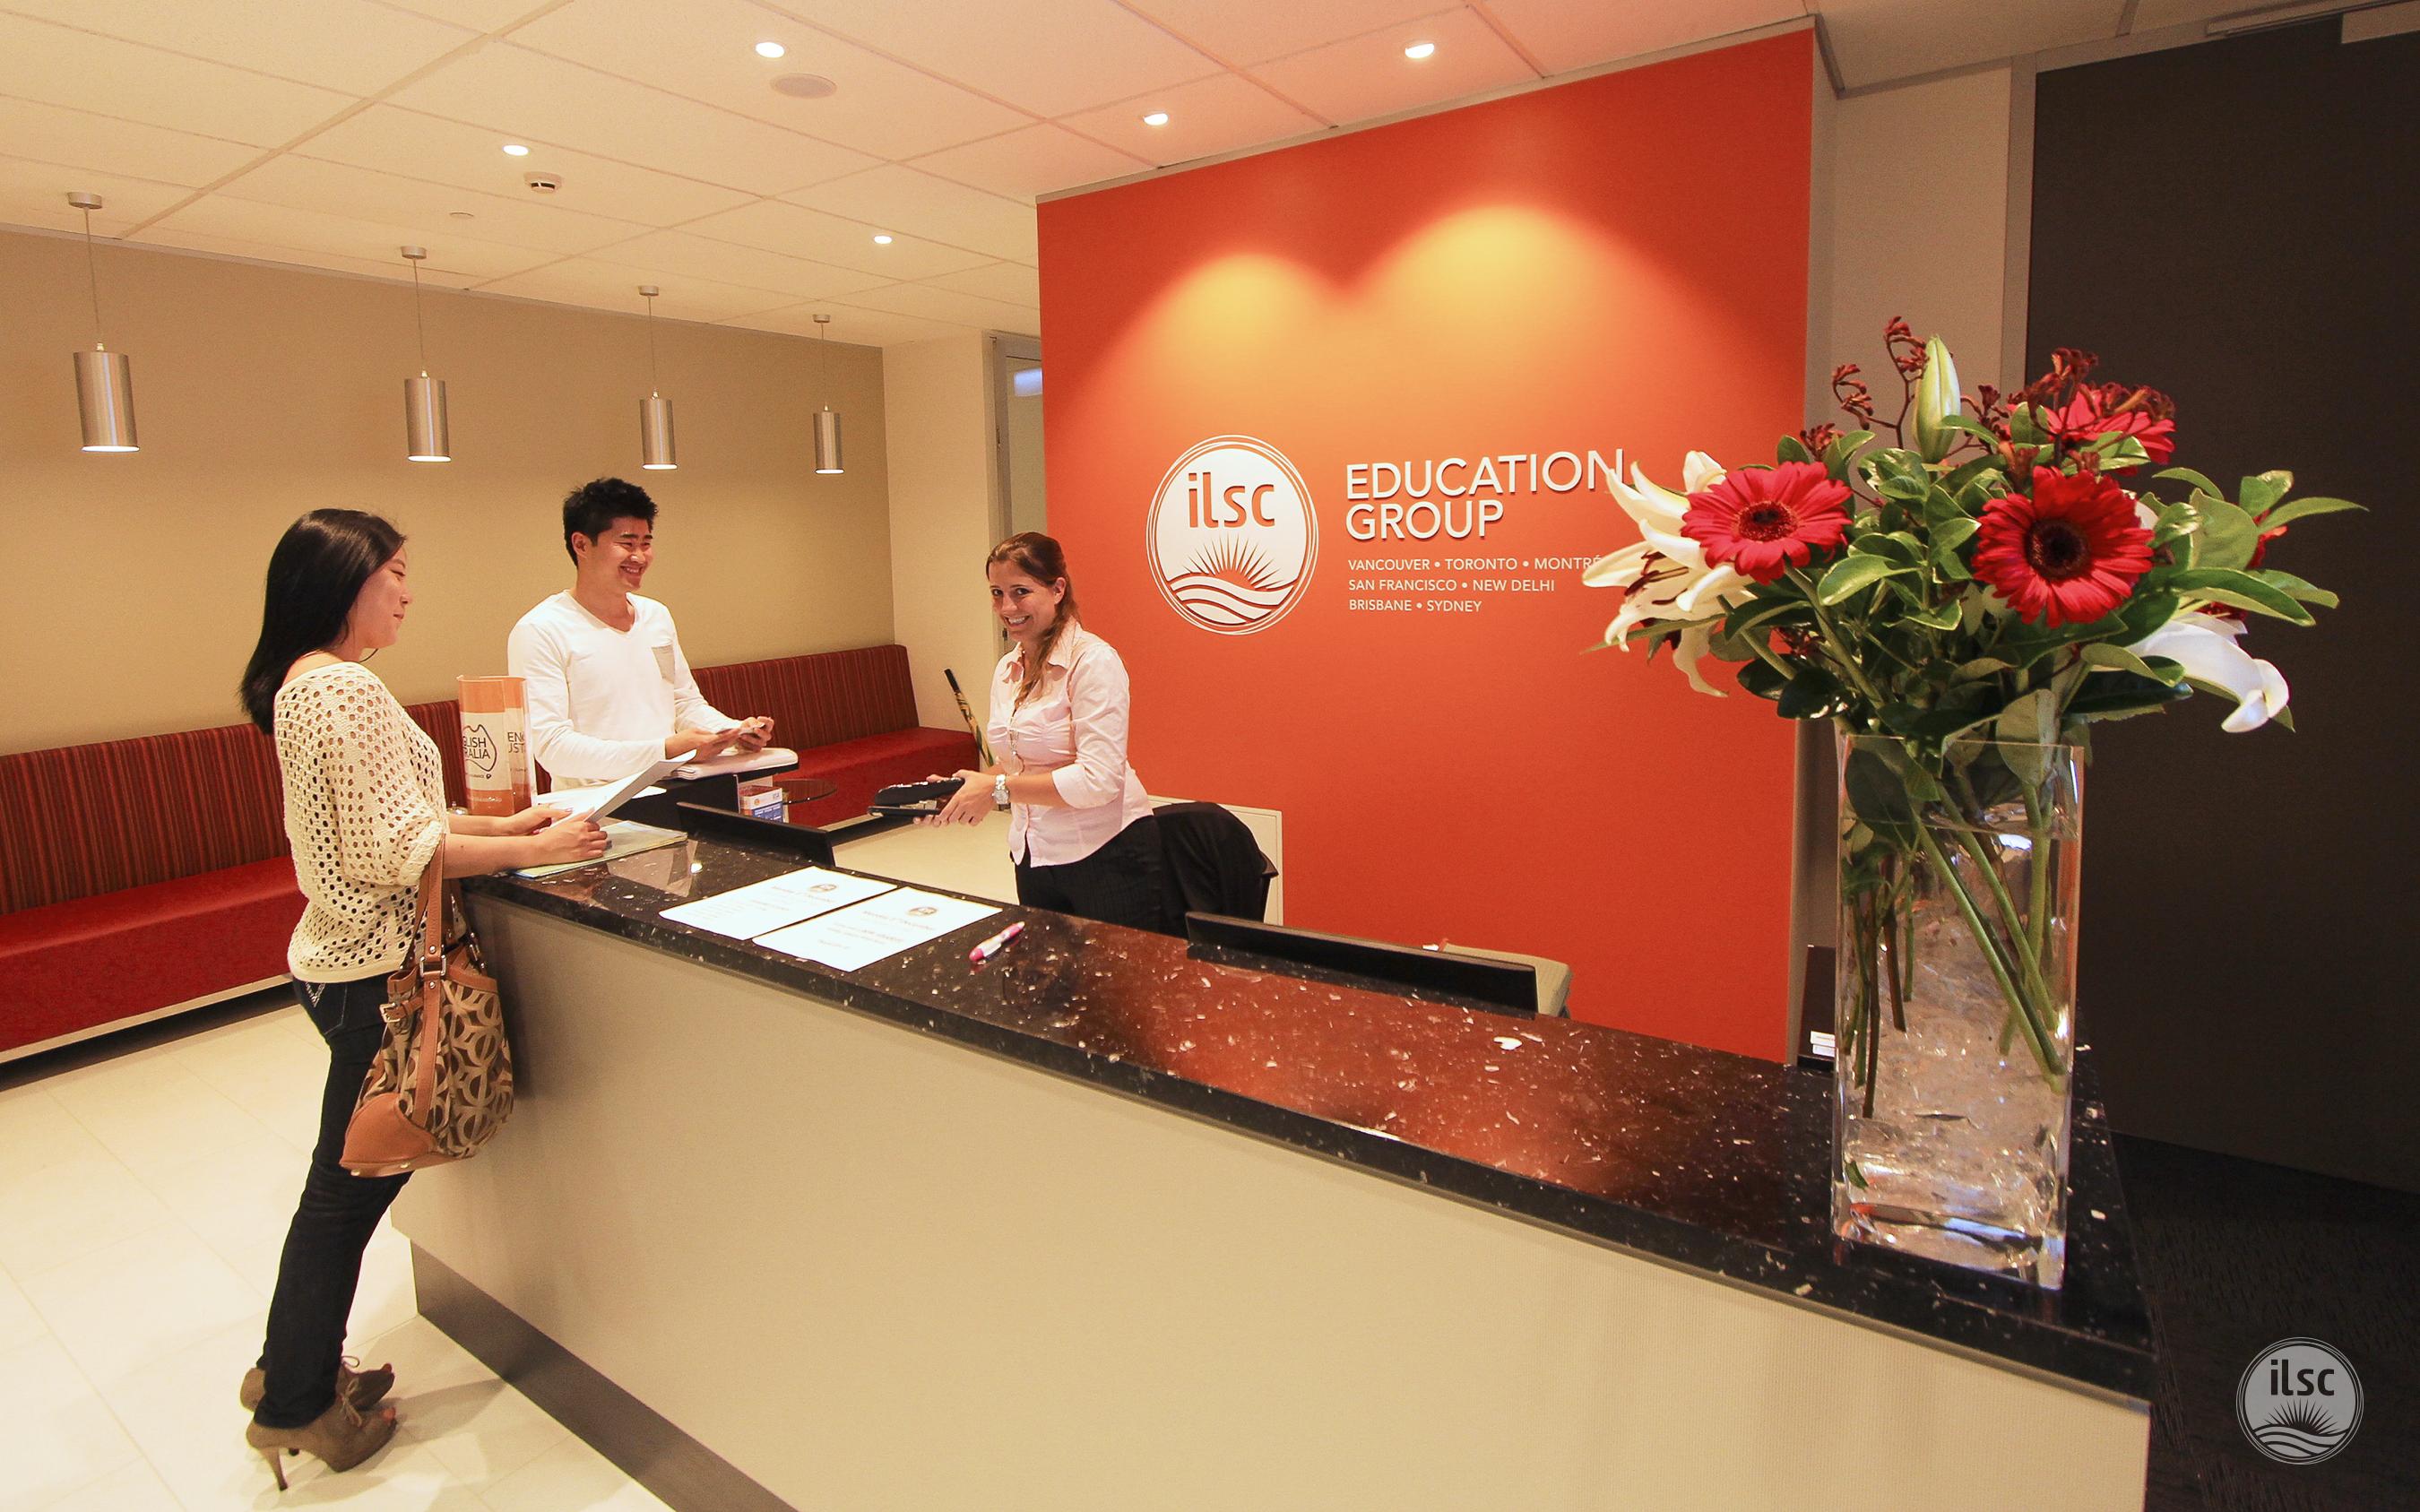 ILSC Language Schools Sydney Campus